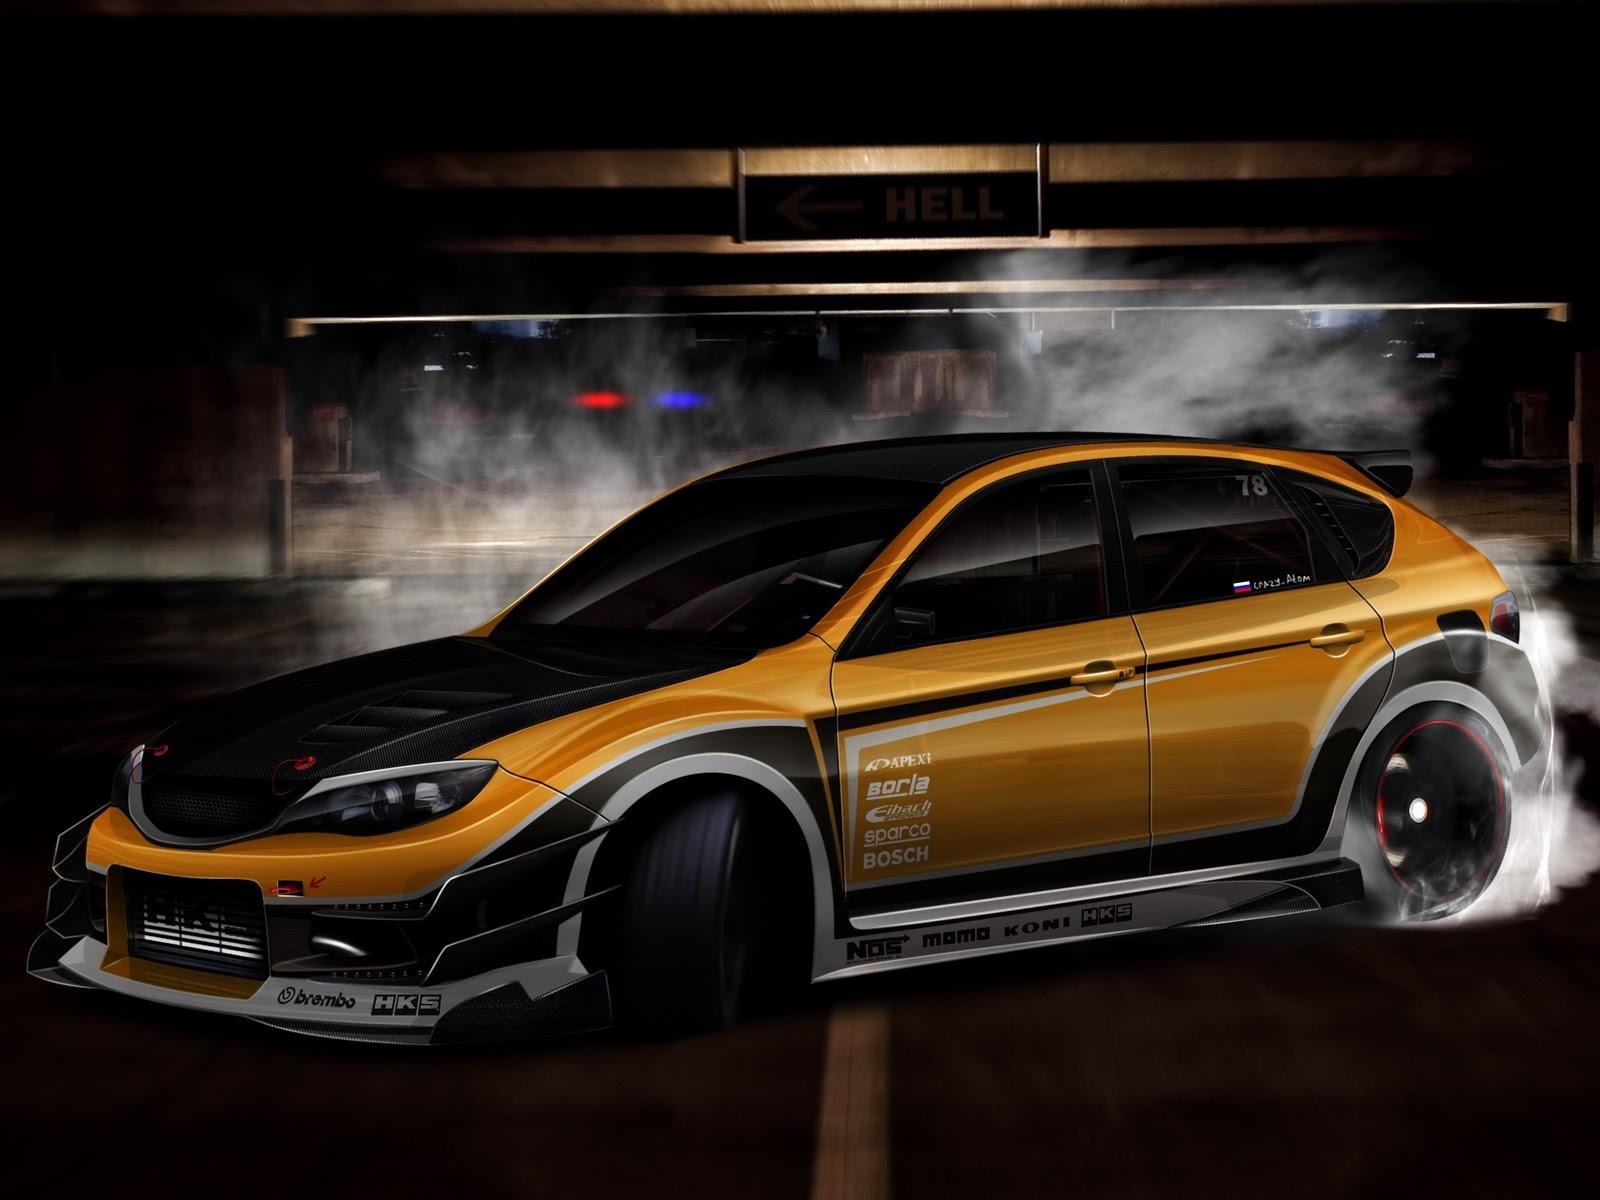 Hd-Car wallpapers: Hd Car wallpapers